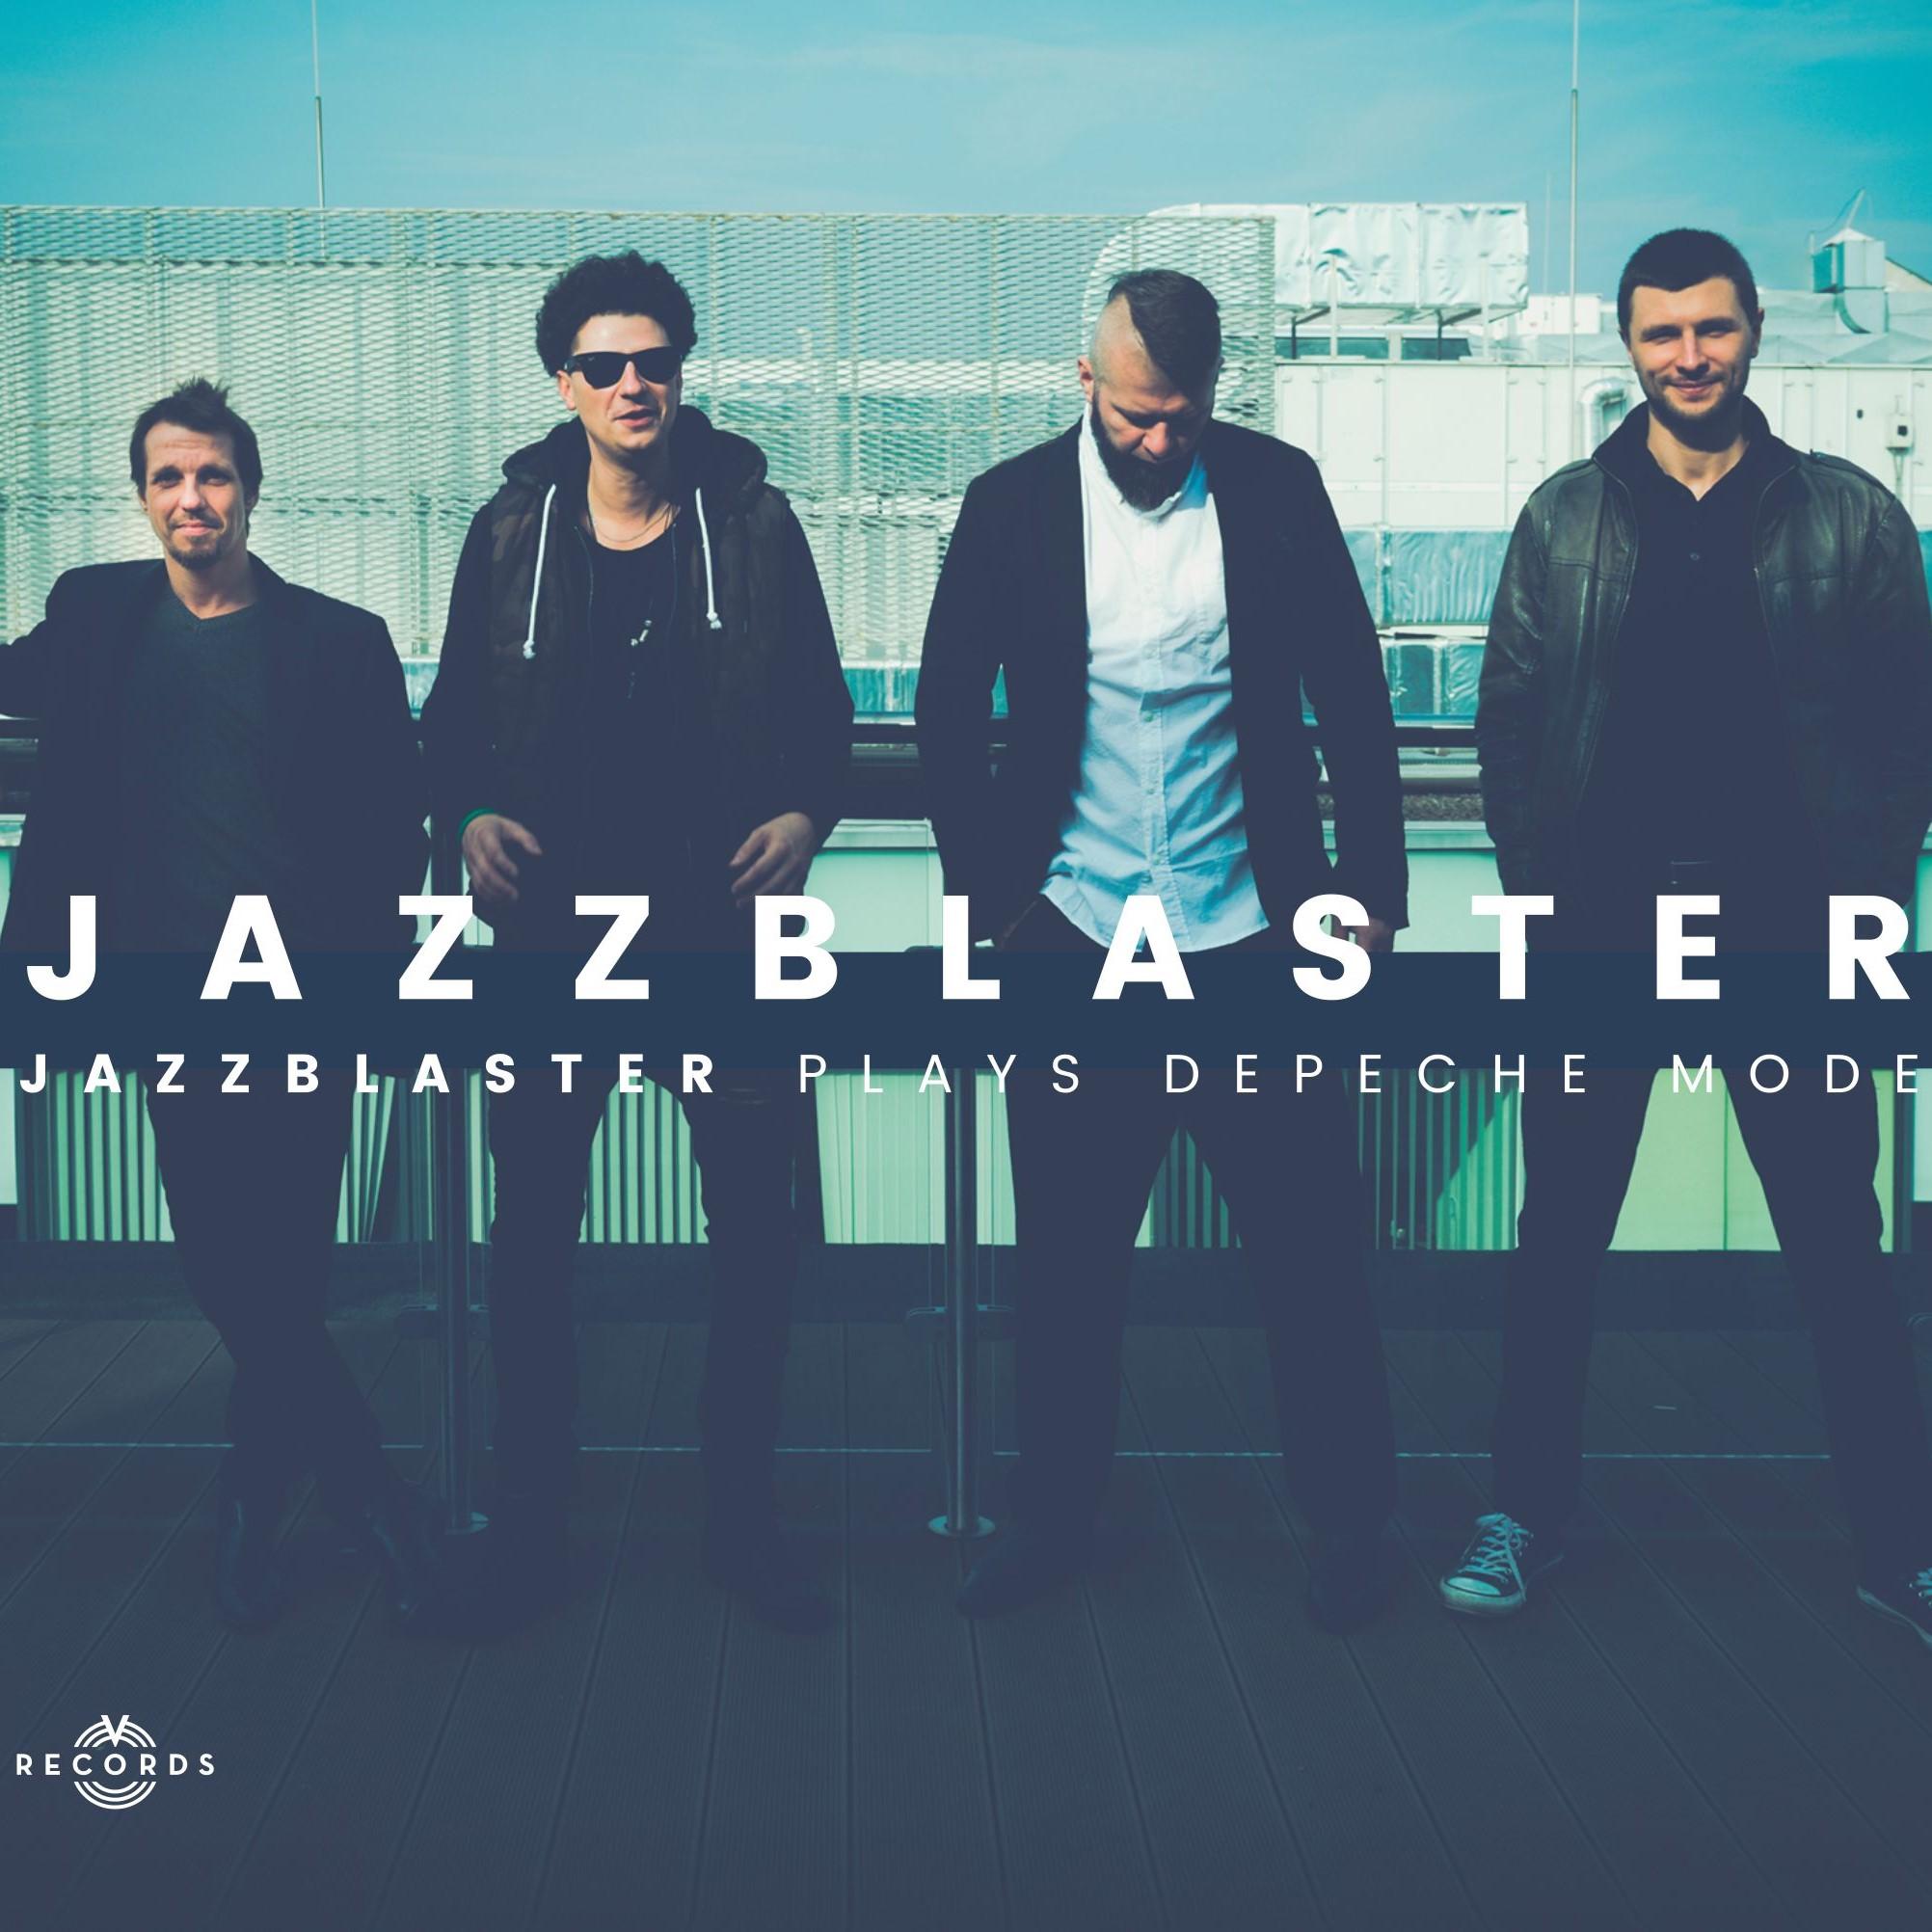 jazzblaster-cover.jpg